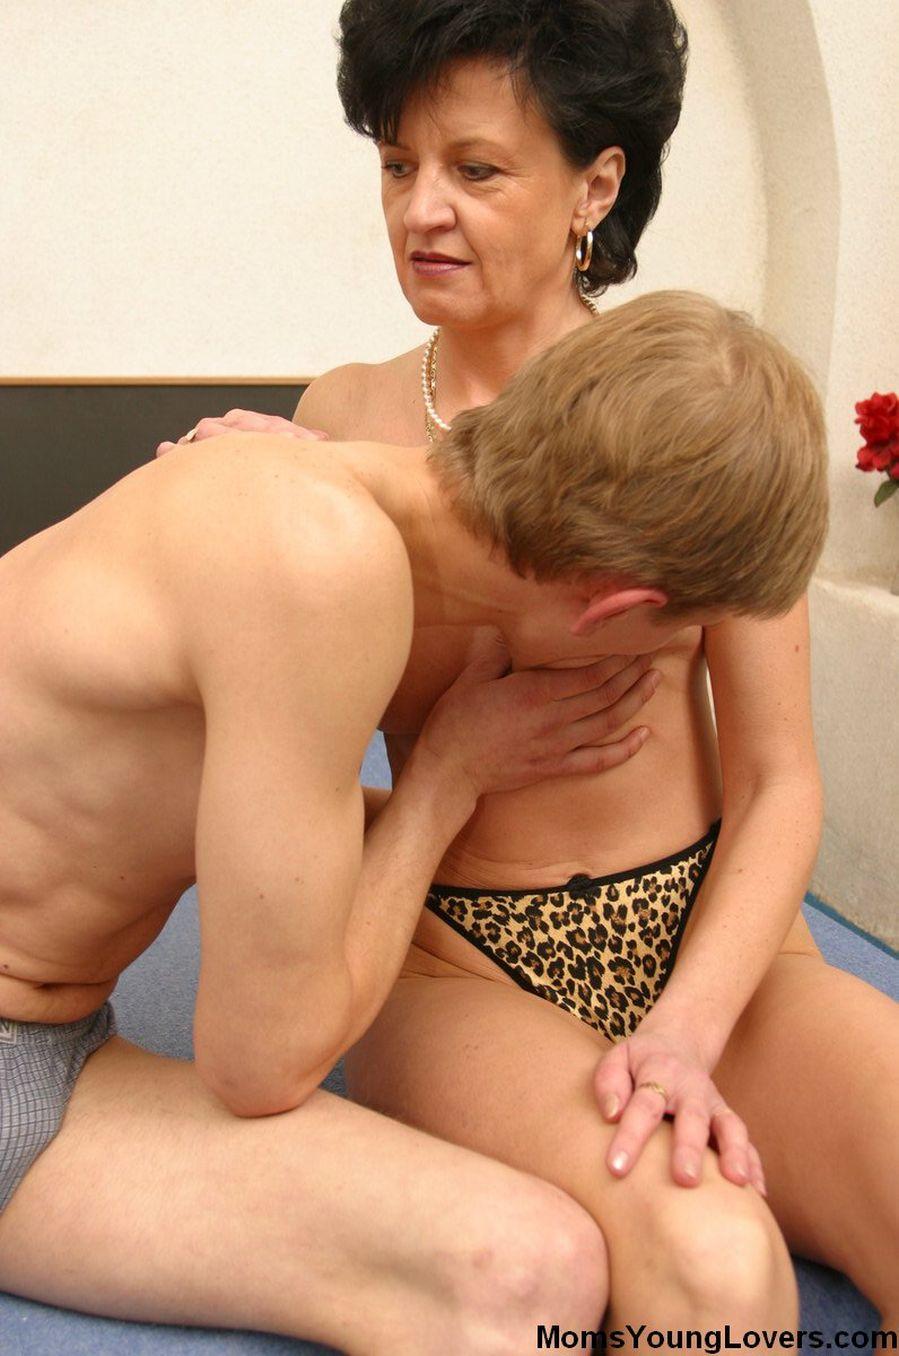 Старарая эротика мать сын онлайн 7 фотография